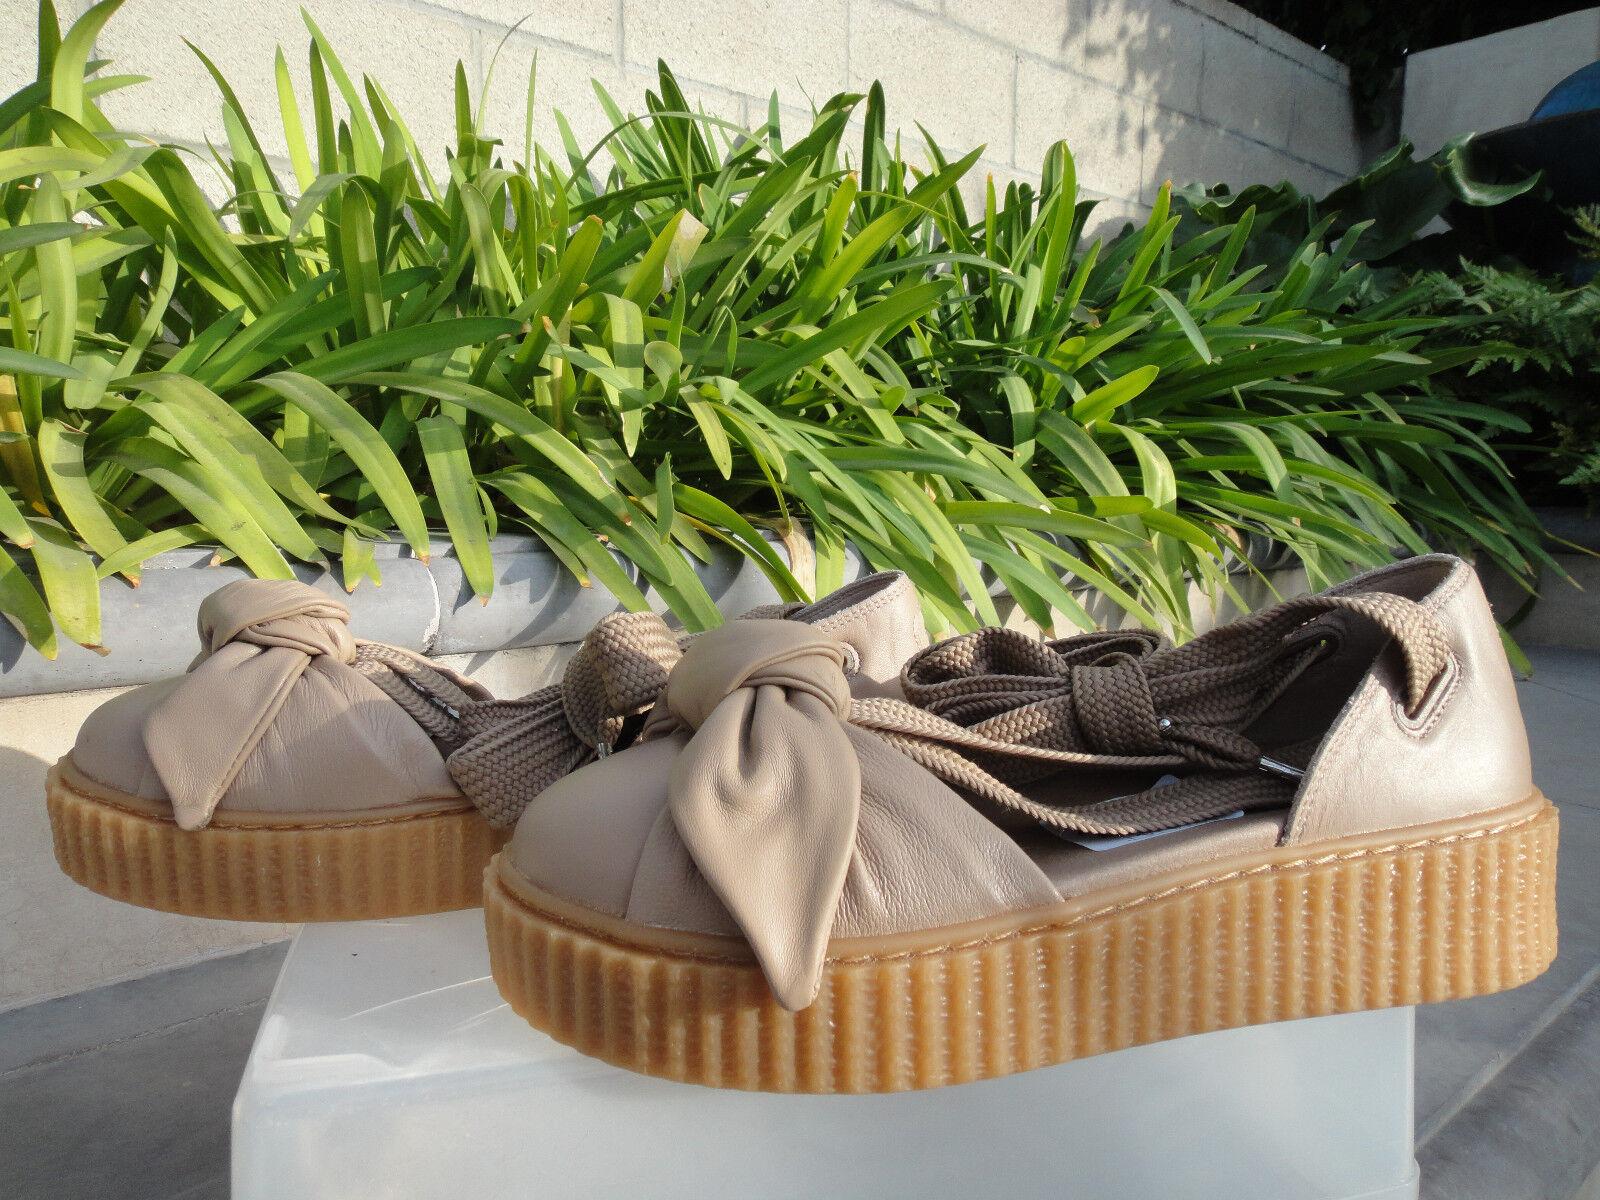 zapatostring Puma de Rihanna, arco Creeper Sandalias Sandalias Sandalias Plataforma, harina de avena, eligió Tamaño Natural   minorista de fitness